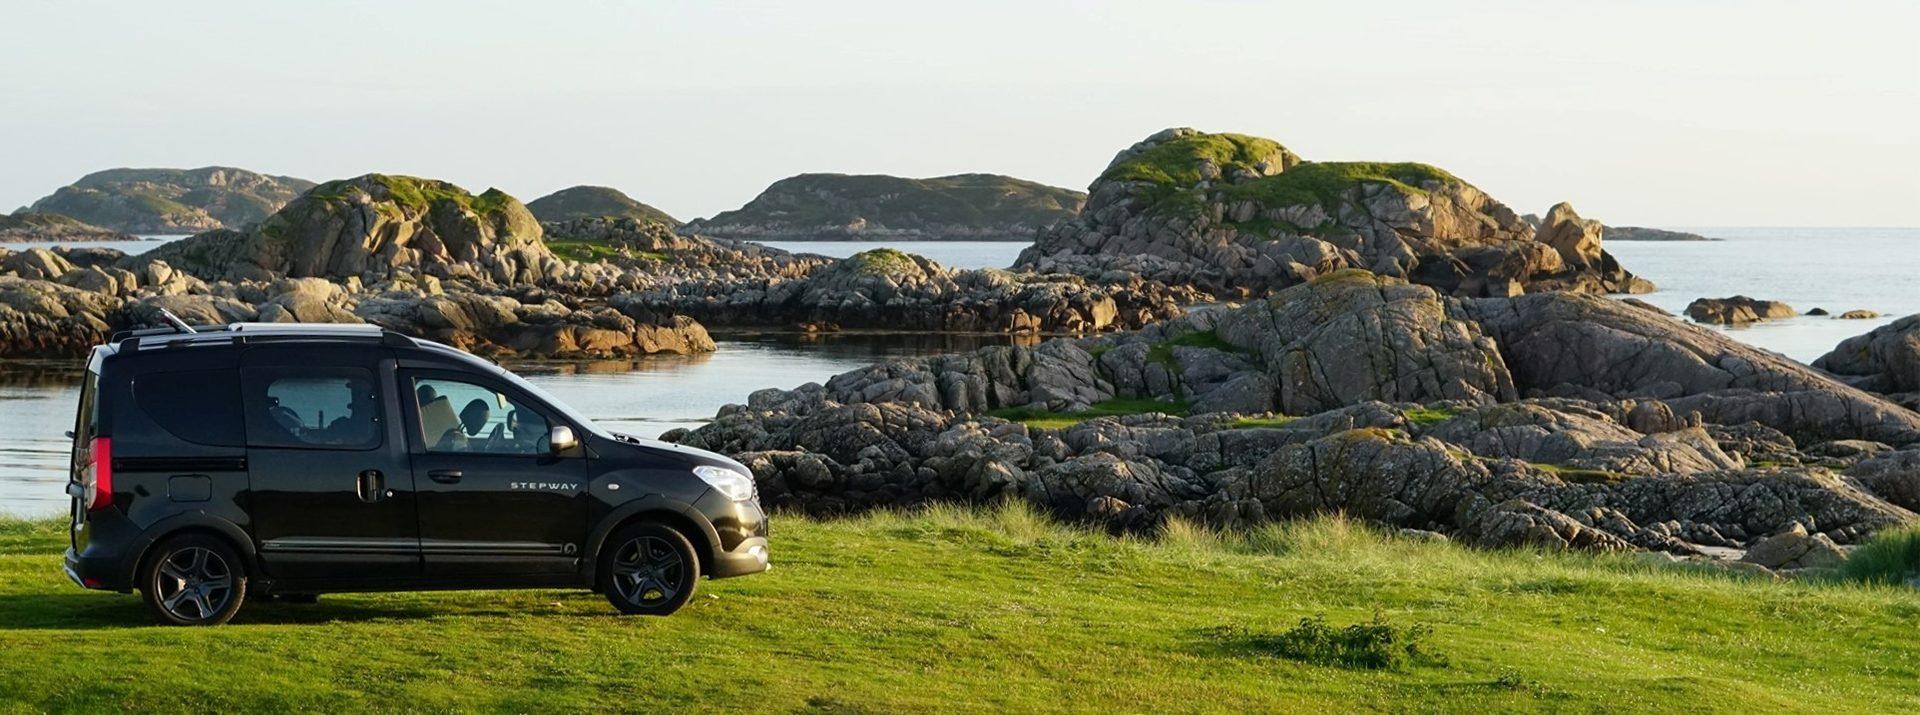 Dacia Dokker kust sfeerfoto